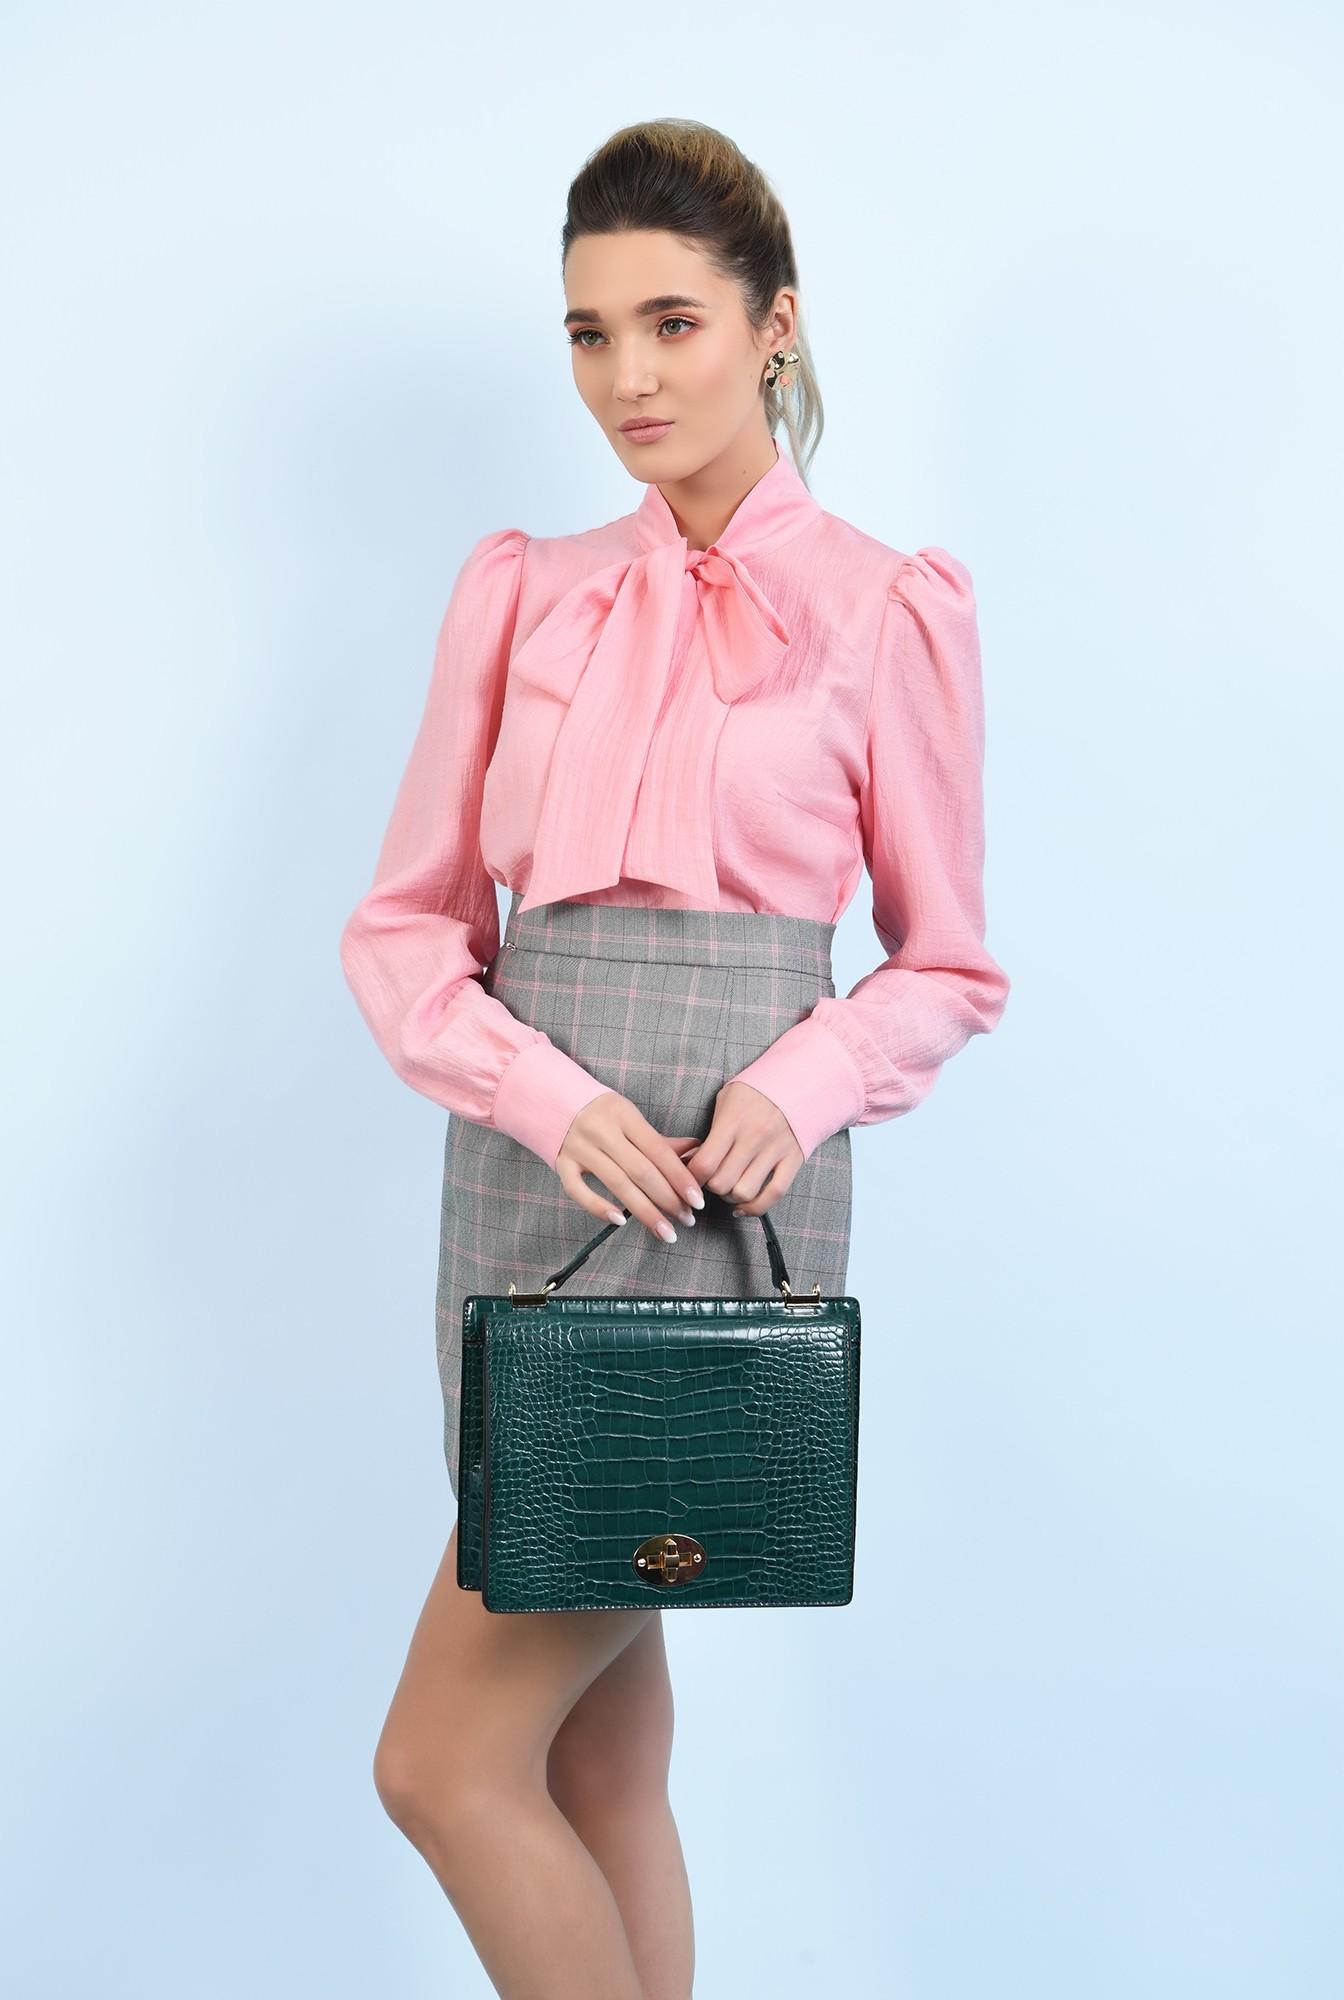 0 - bluza casual, roz, cu funda, maneci lungi, Poema